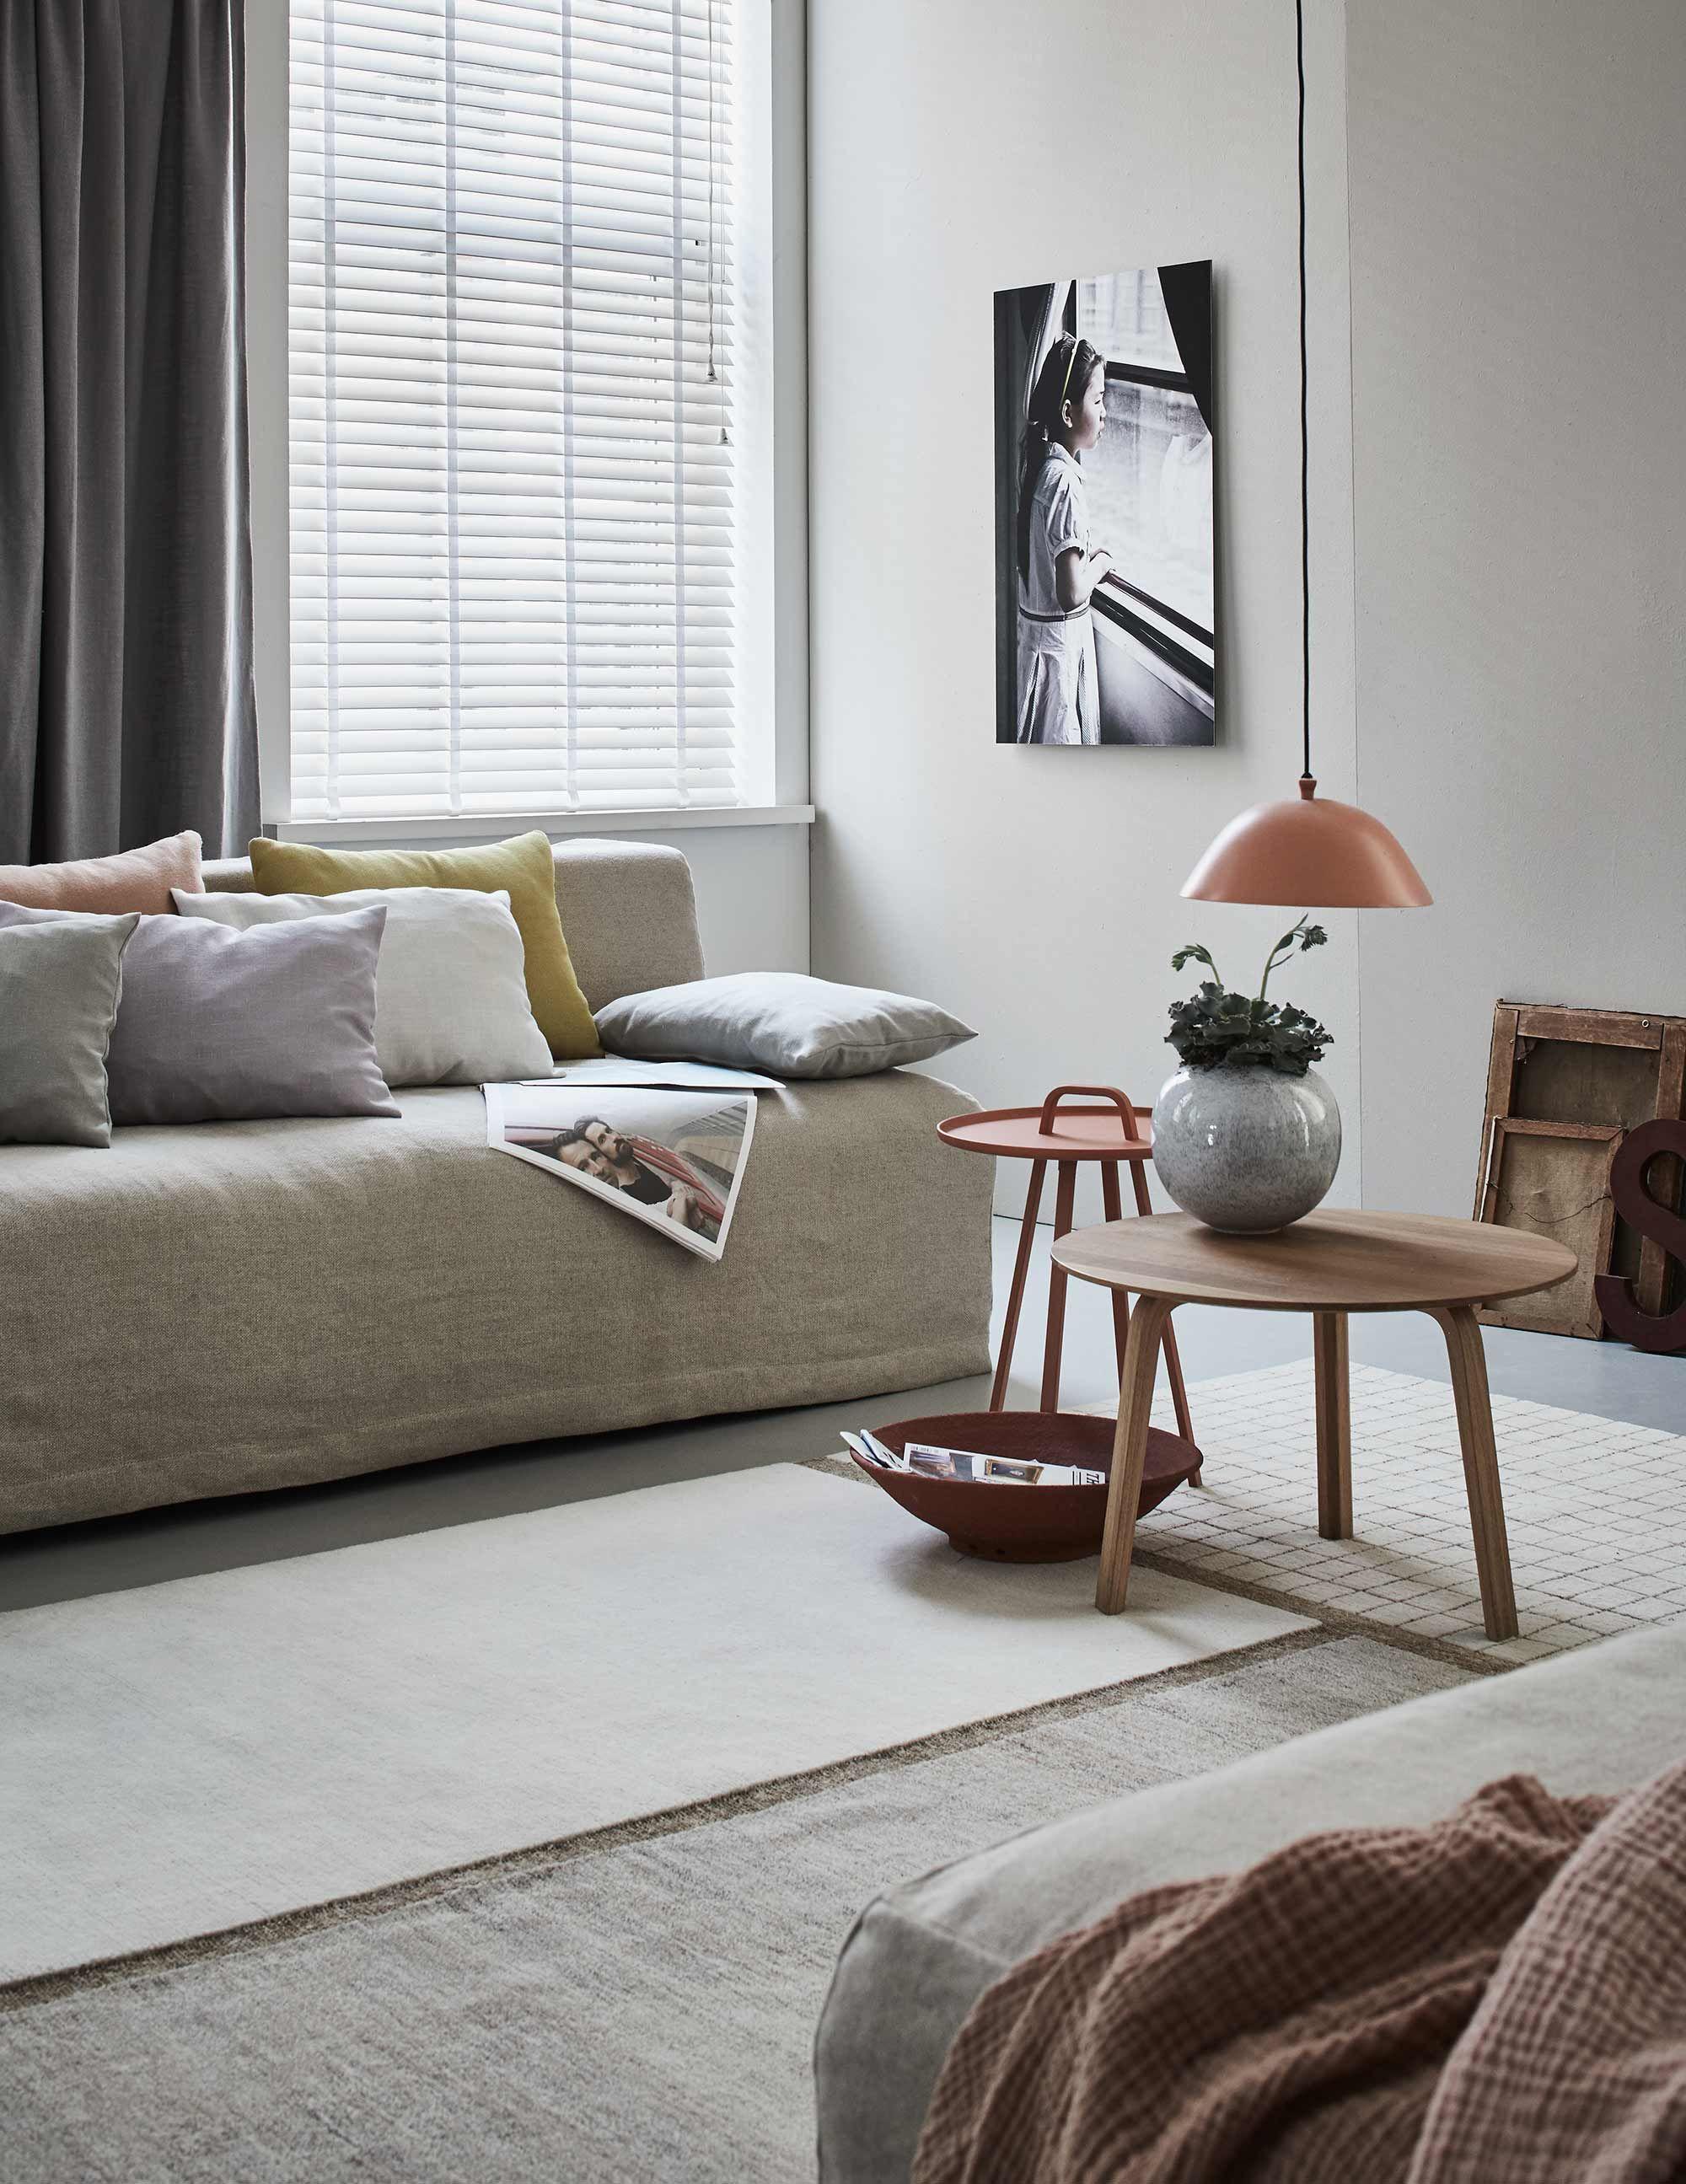 Nude woonkamer | Nude livingroom | vtwonen 11-2016 | photography ...